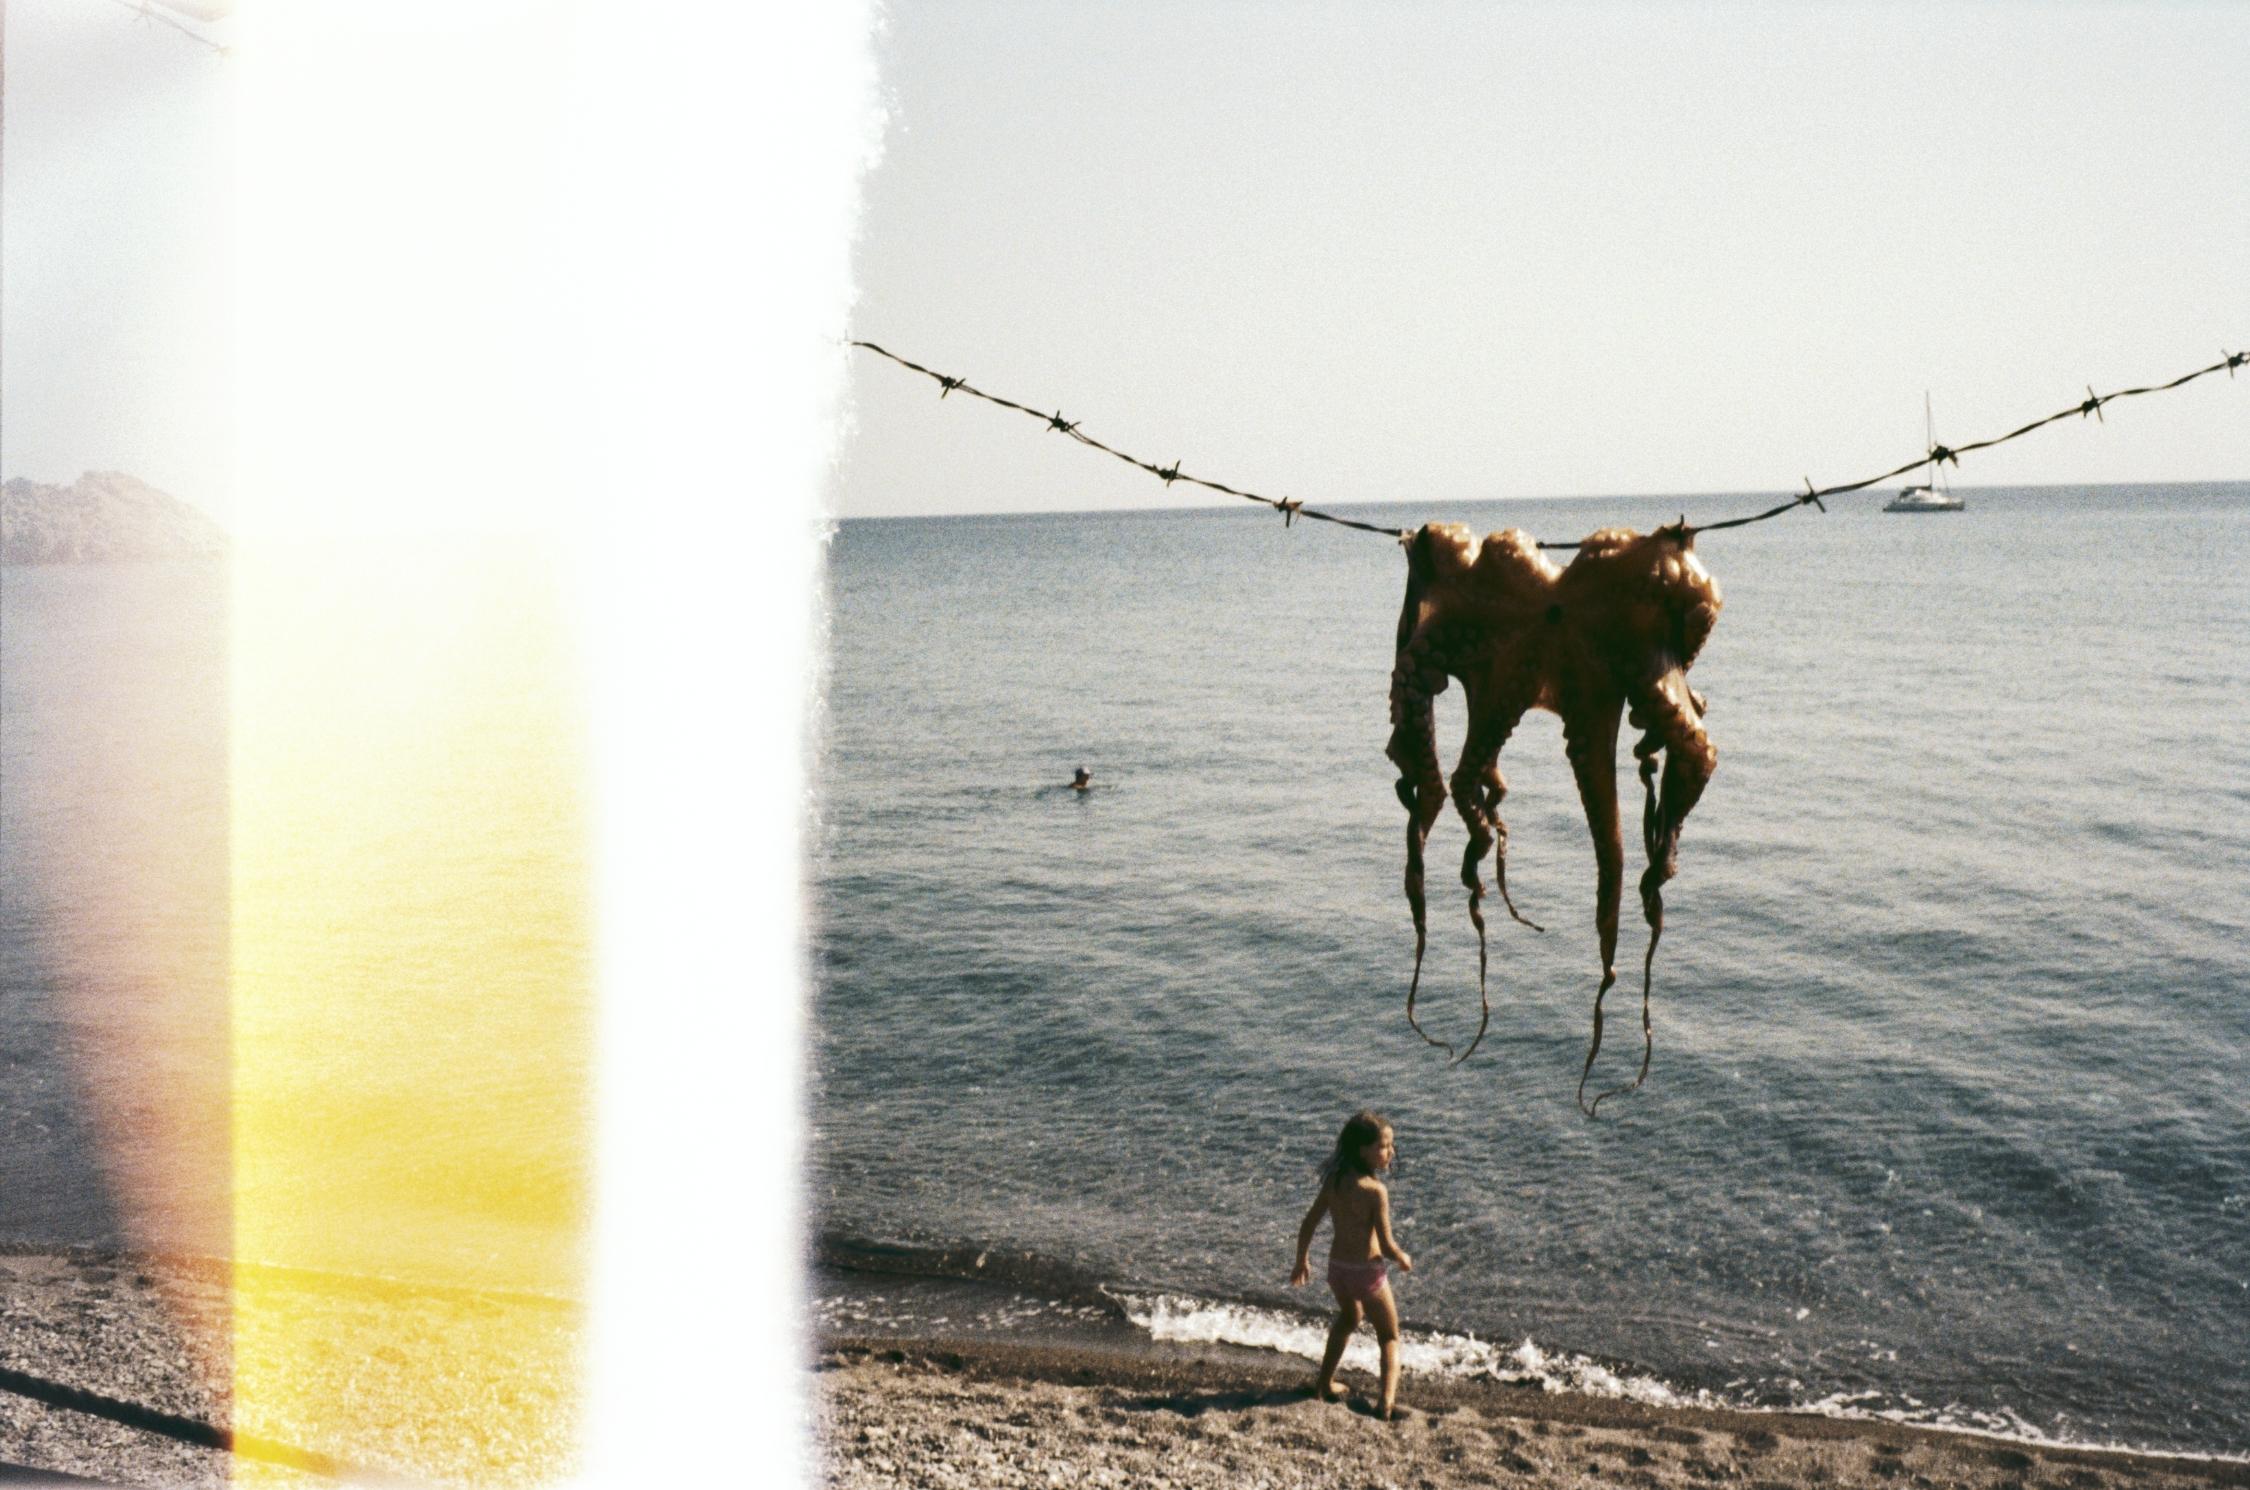 lesvos, greece, july 2012